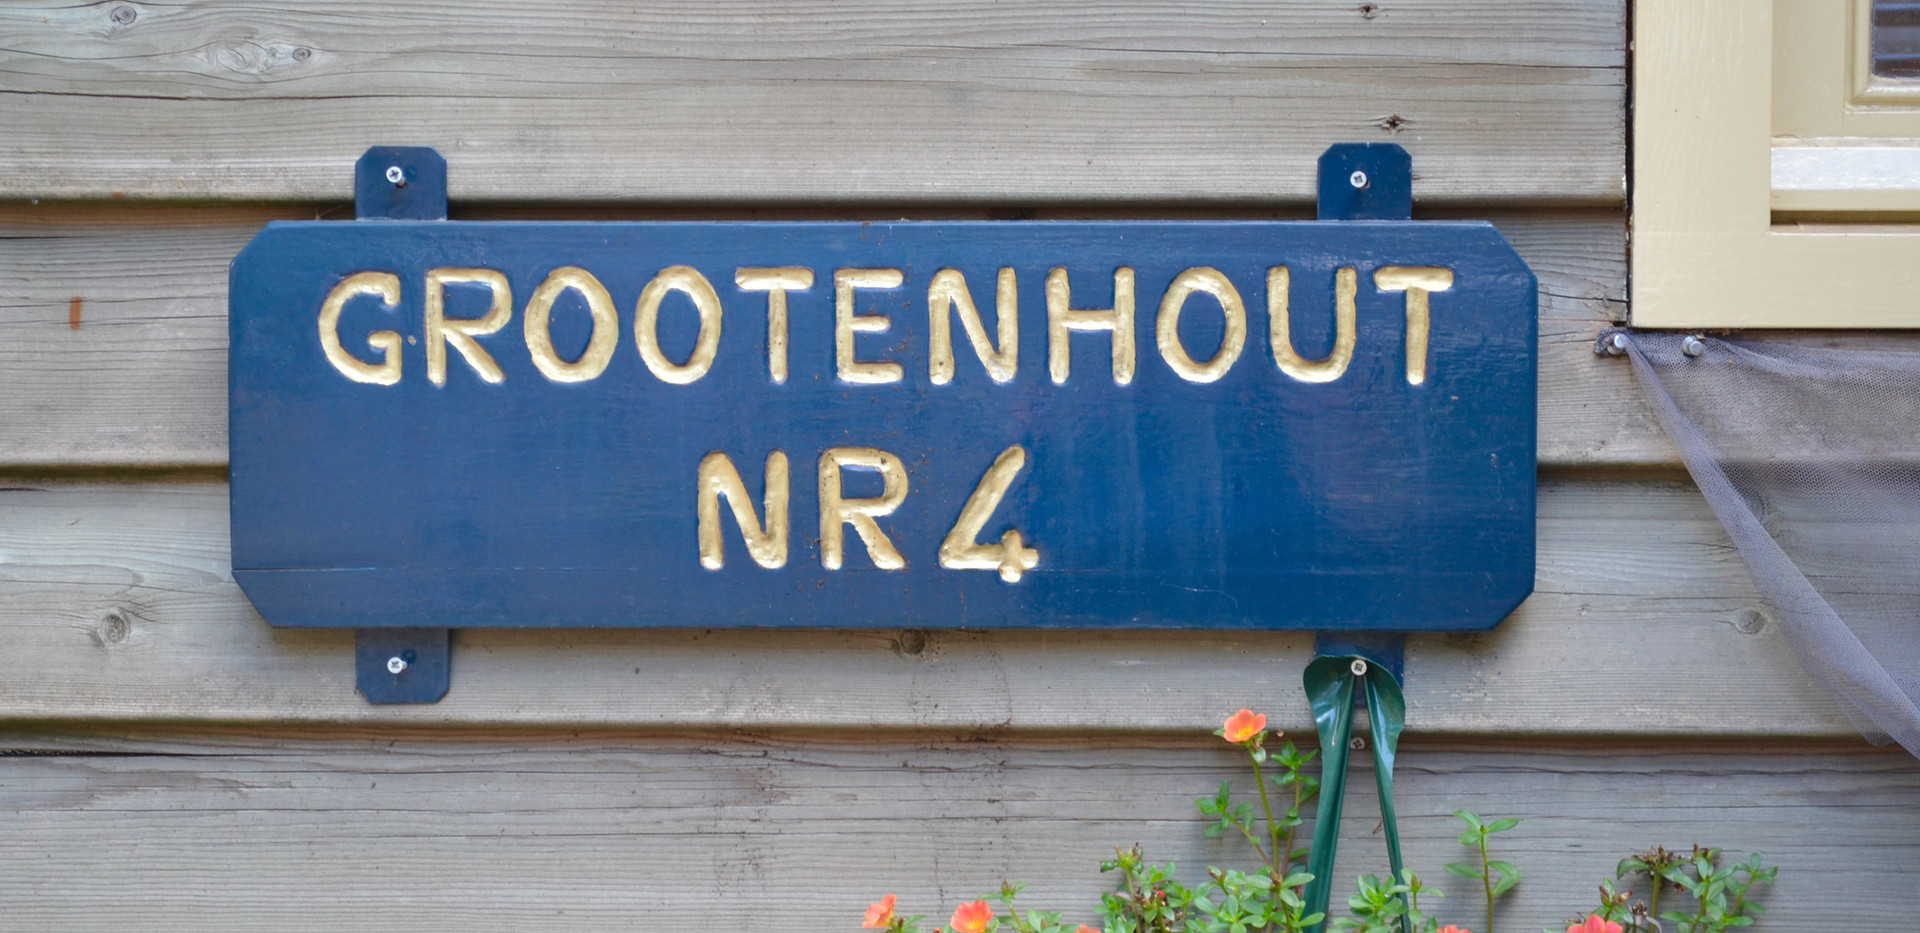 Grootenhout 4